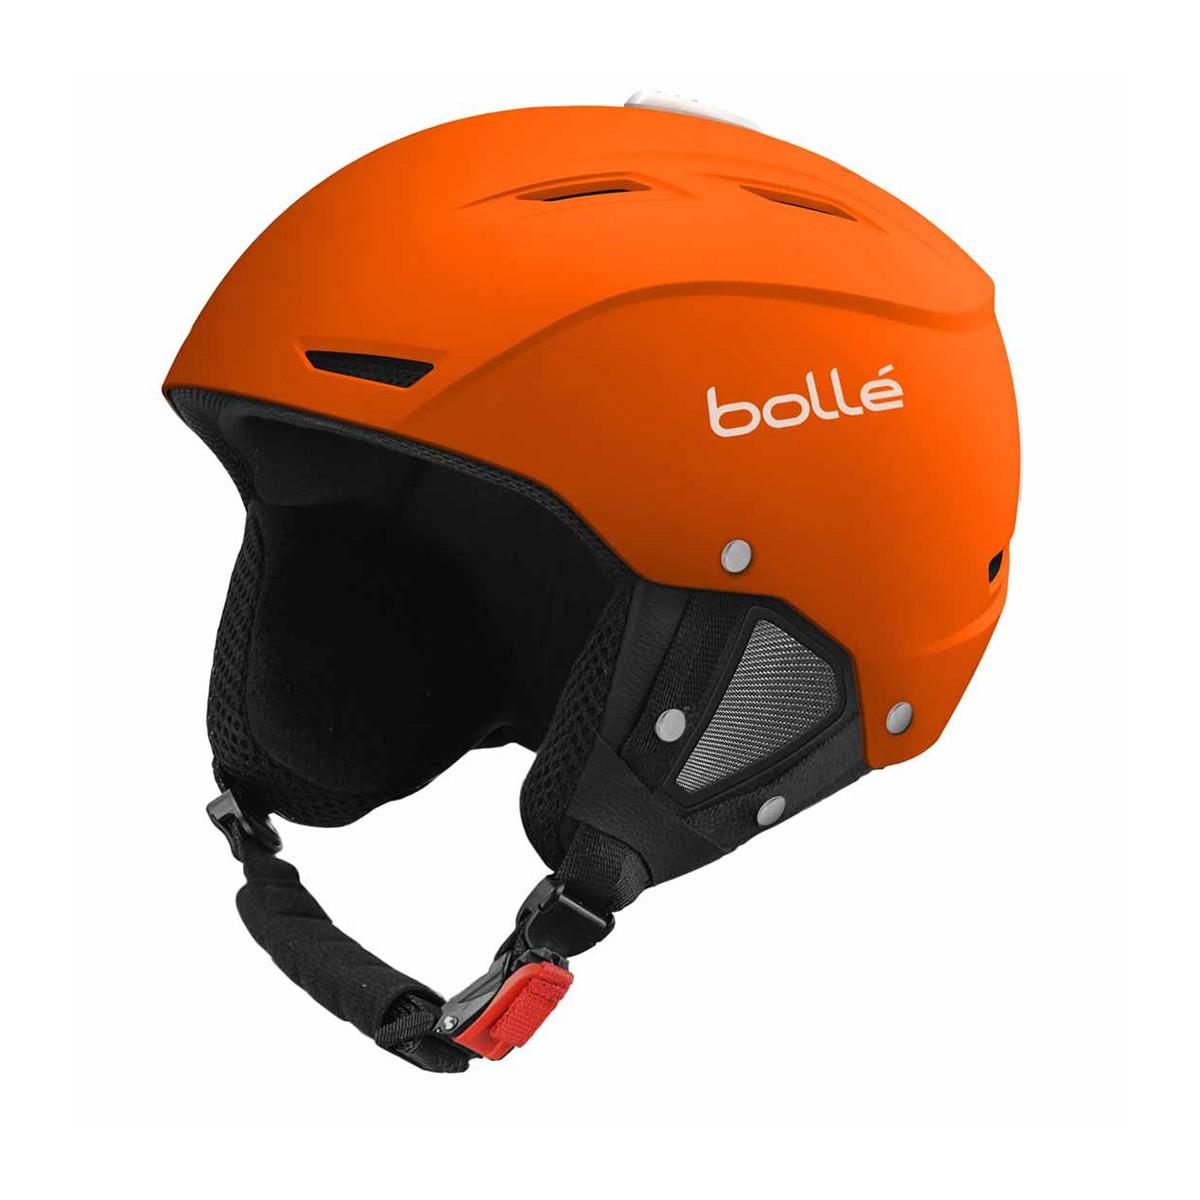 casque de protection backline bolle casque de ski et surf inuka. Black Bedroom Furniture Sets. Home Design Ideas